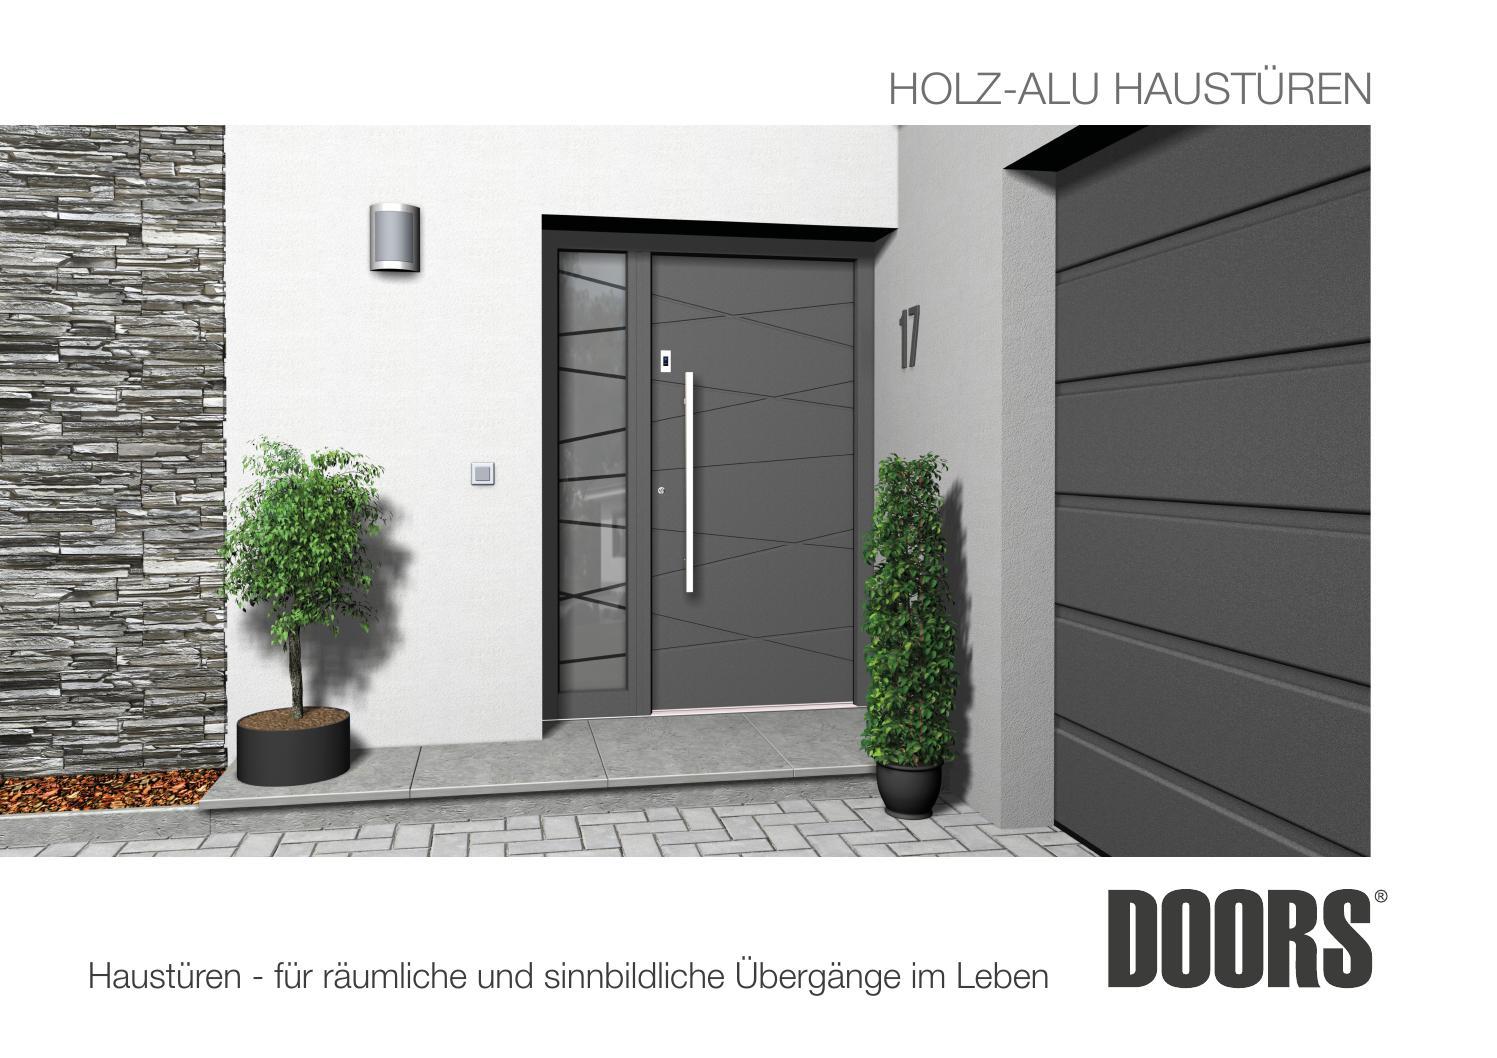 Holz aluminium haust ren by josef fenster t ren issuu for Ral 9006 fenster